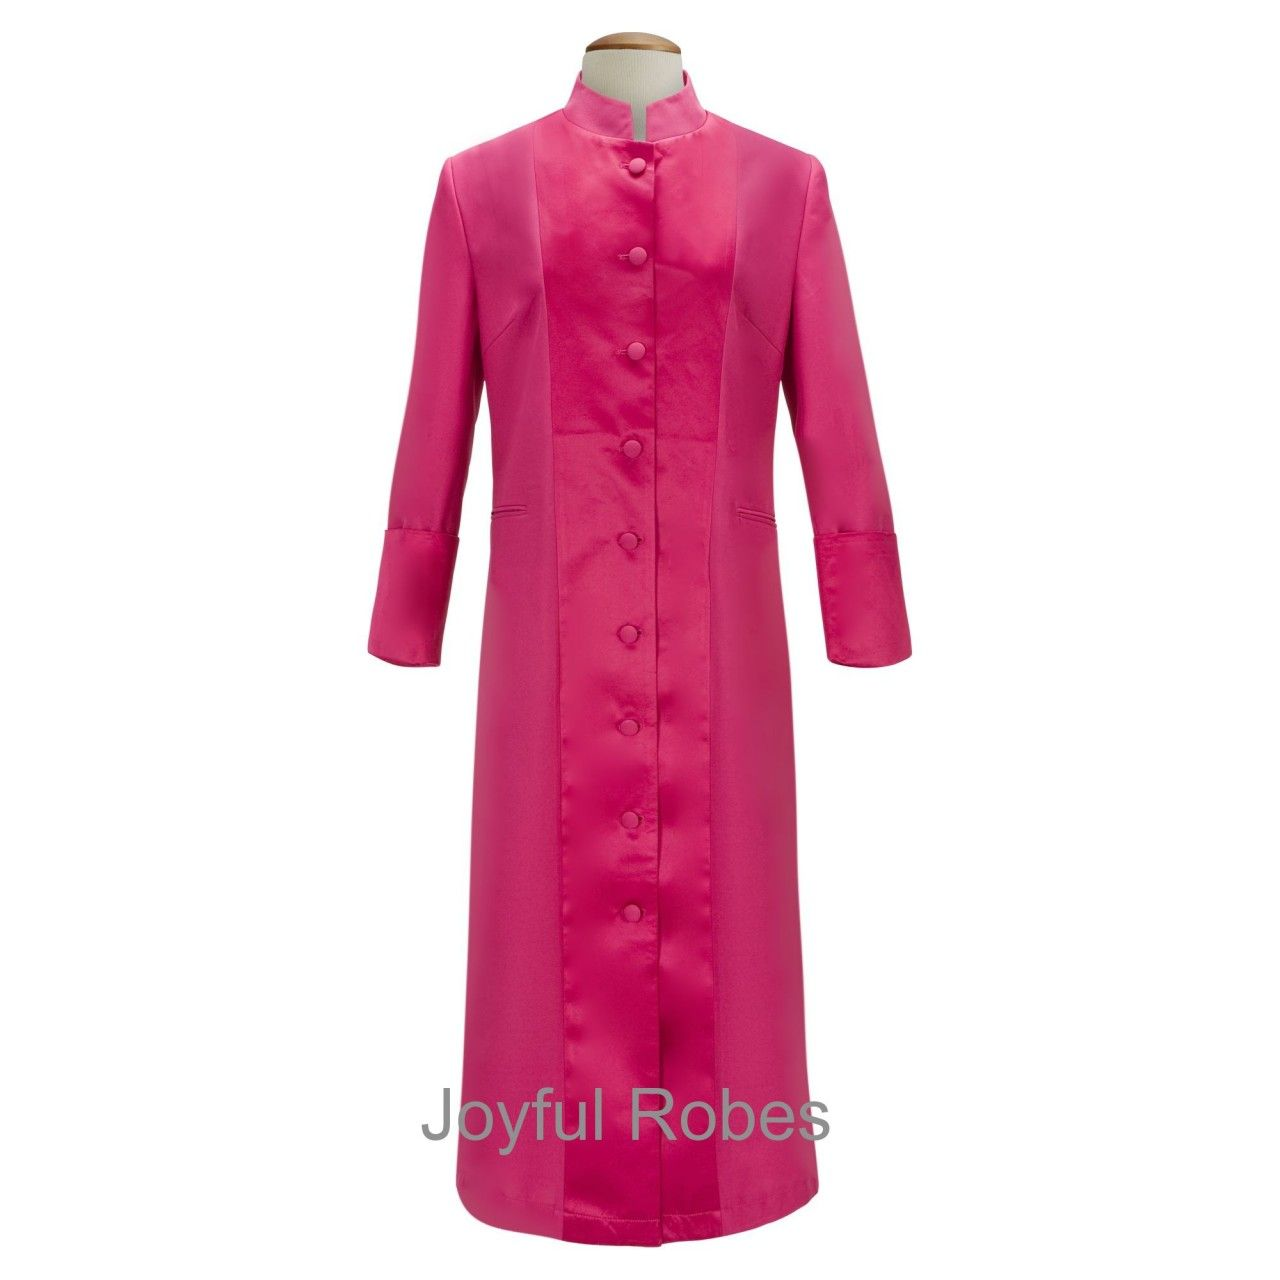 133 W. Women's Pastor/Clergy Robe Fuchsia With Majestic Satin